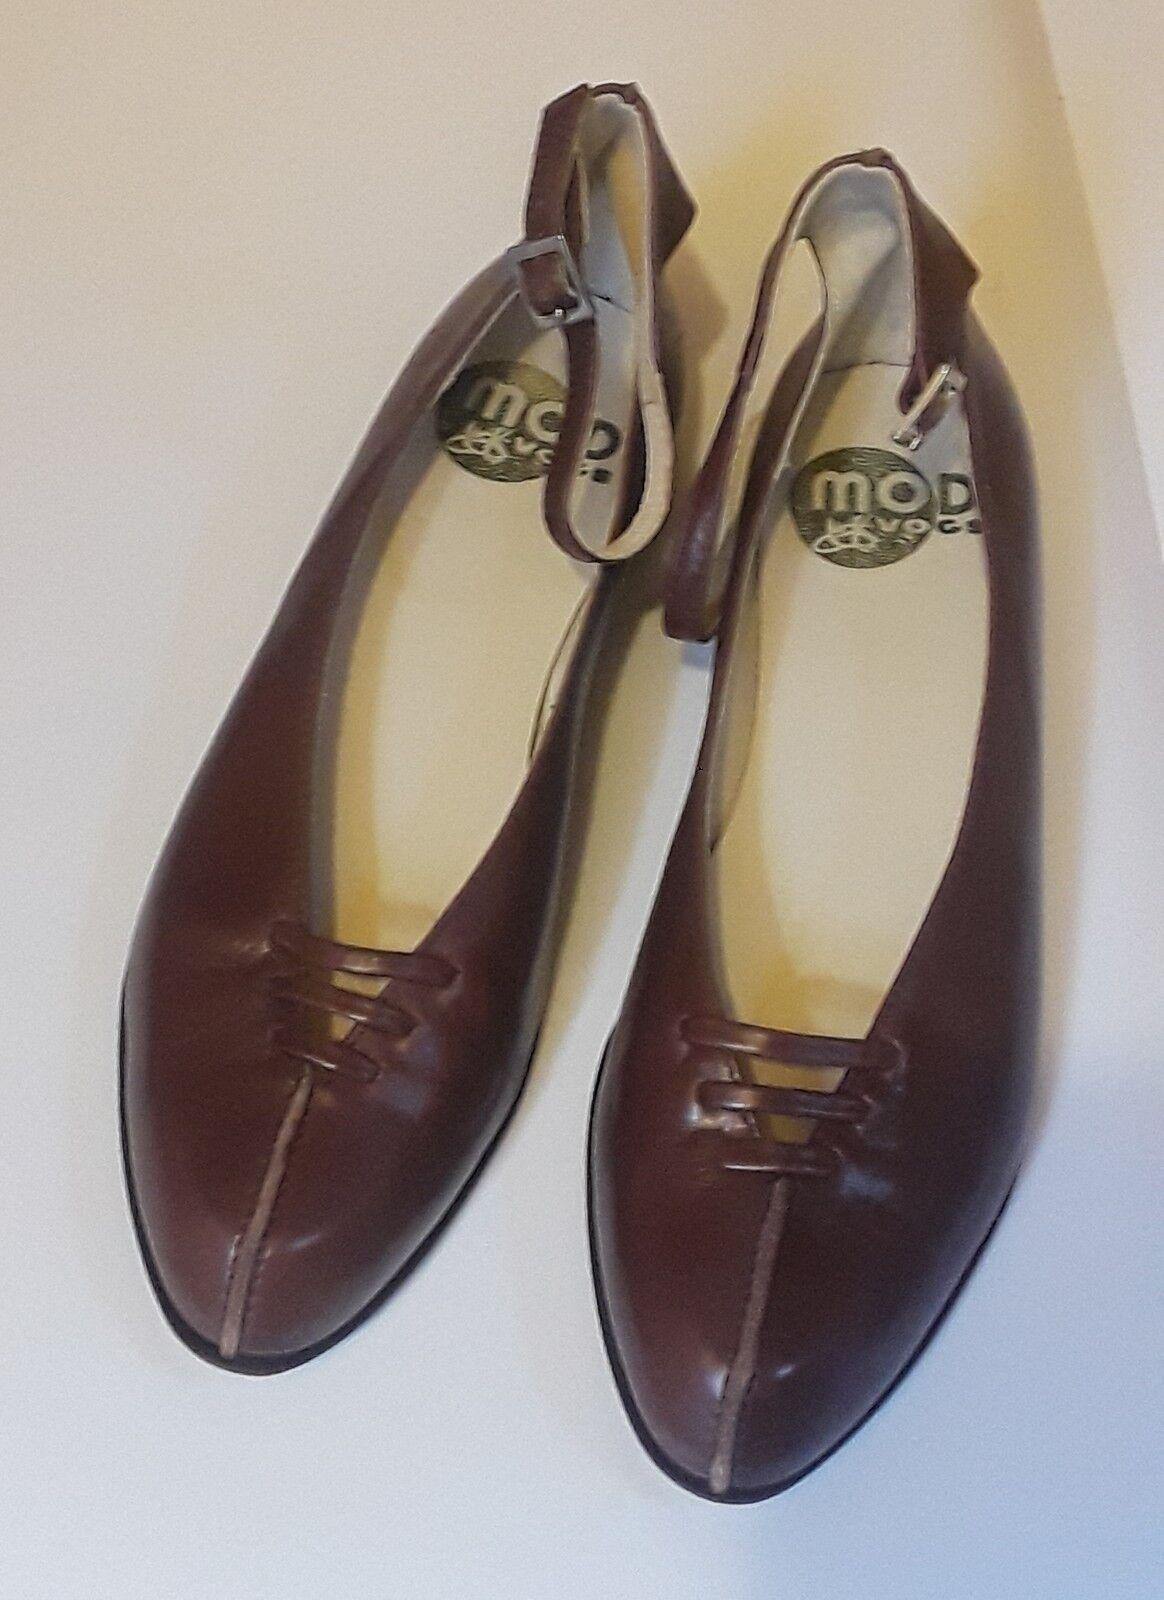 NEW BROWN JOHN FLUEVOG MODVOG: JEN BROWN NEW LEATHER Schuhe 8.5 w ANKLE STRAPS 7c5373